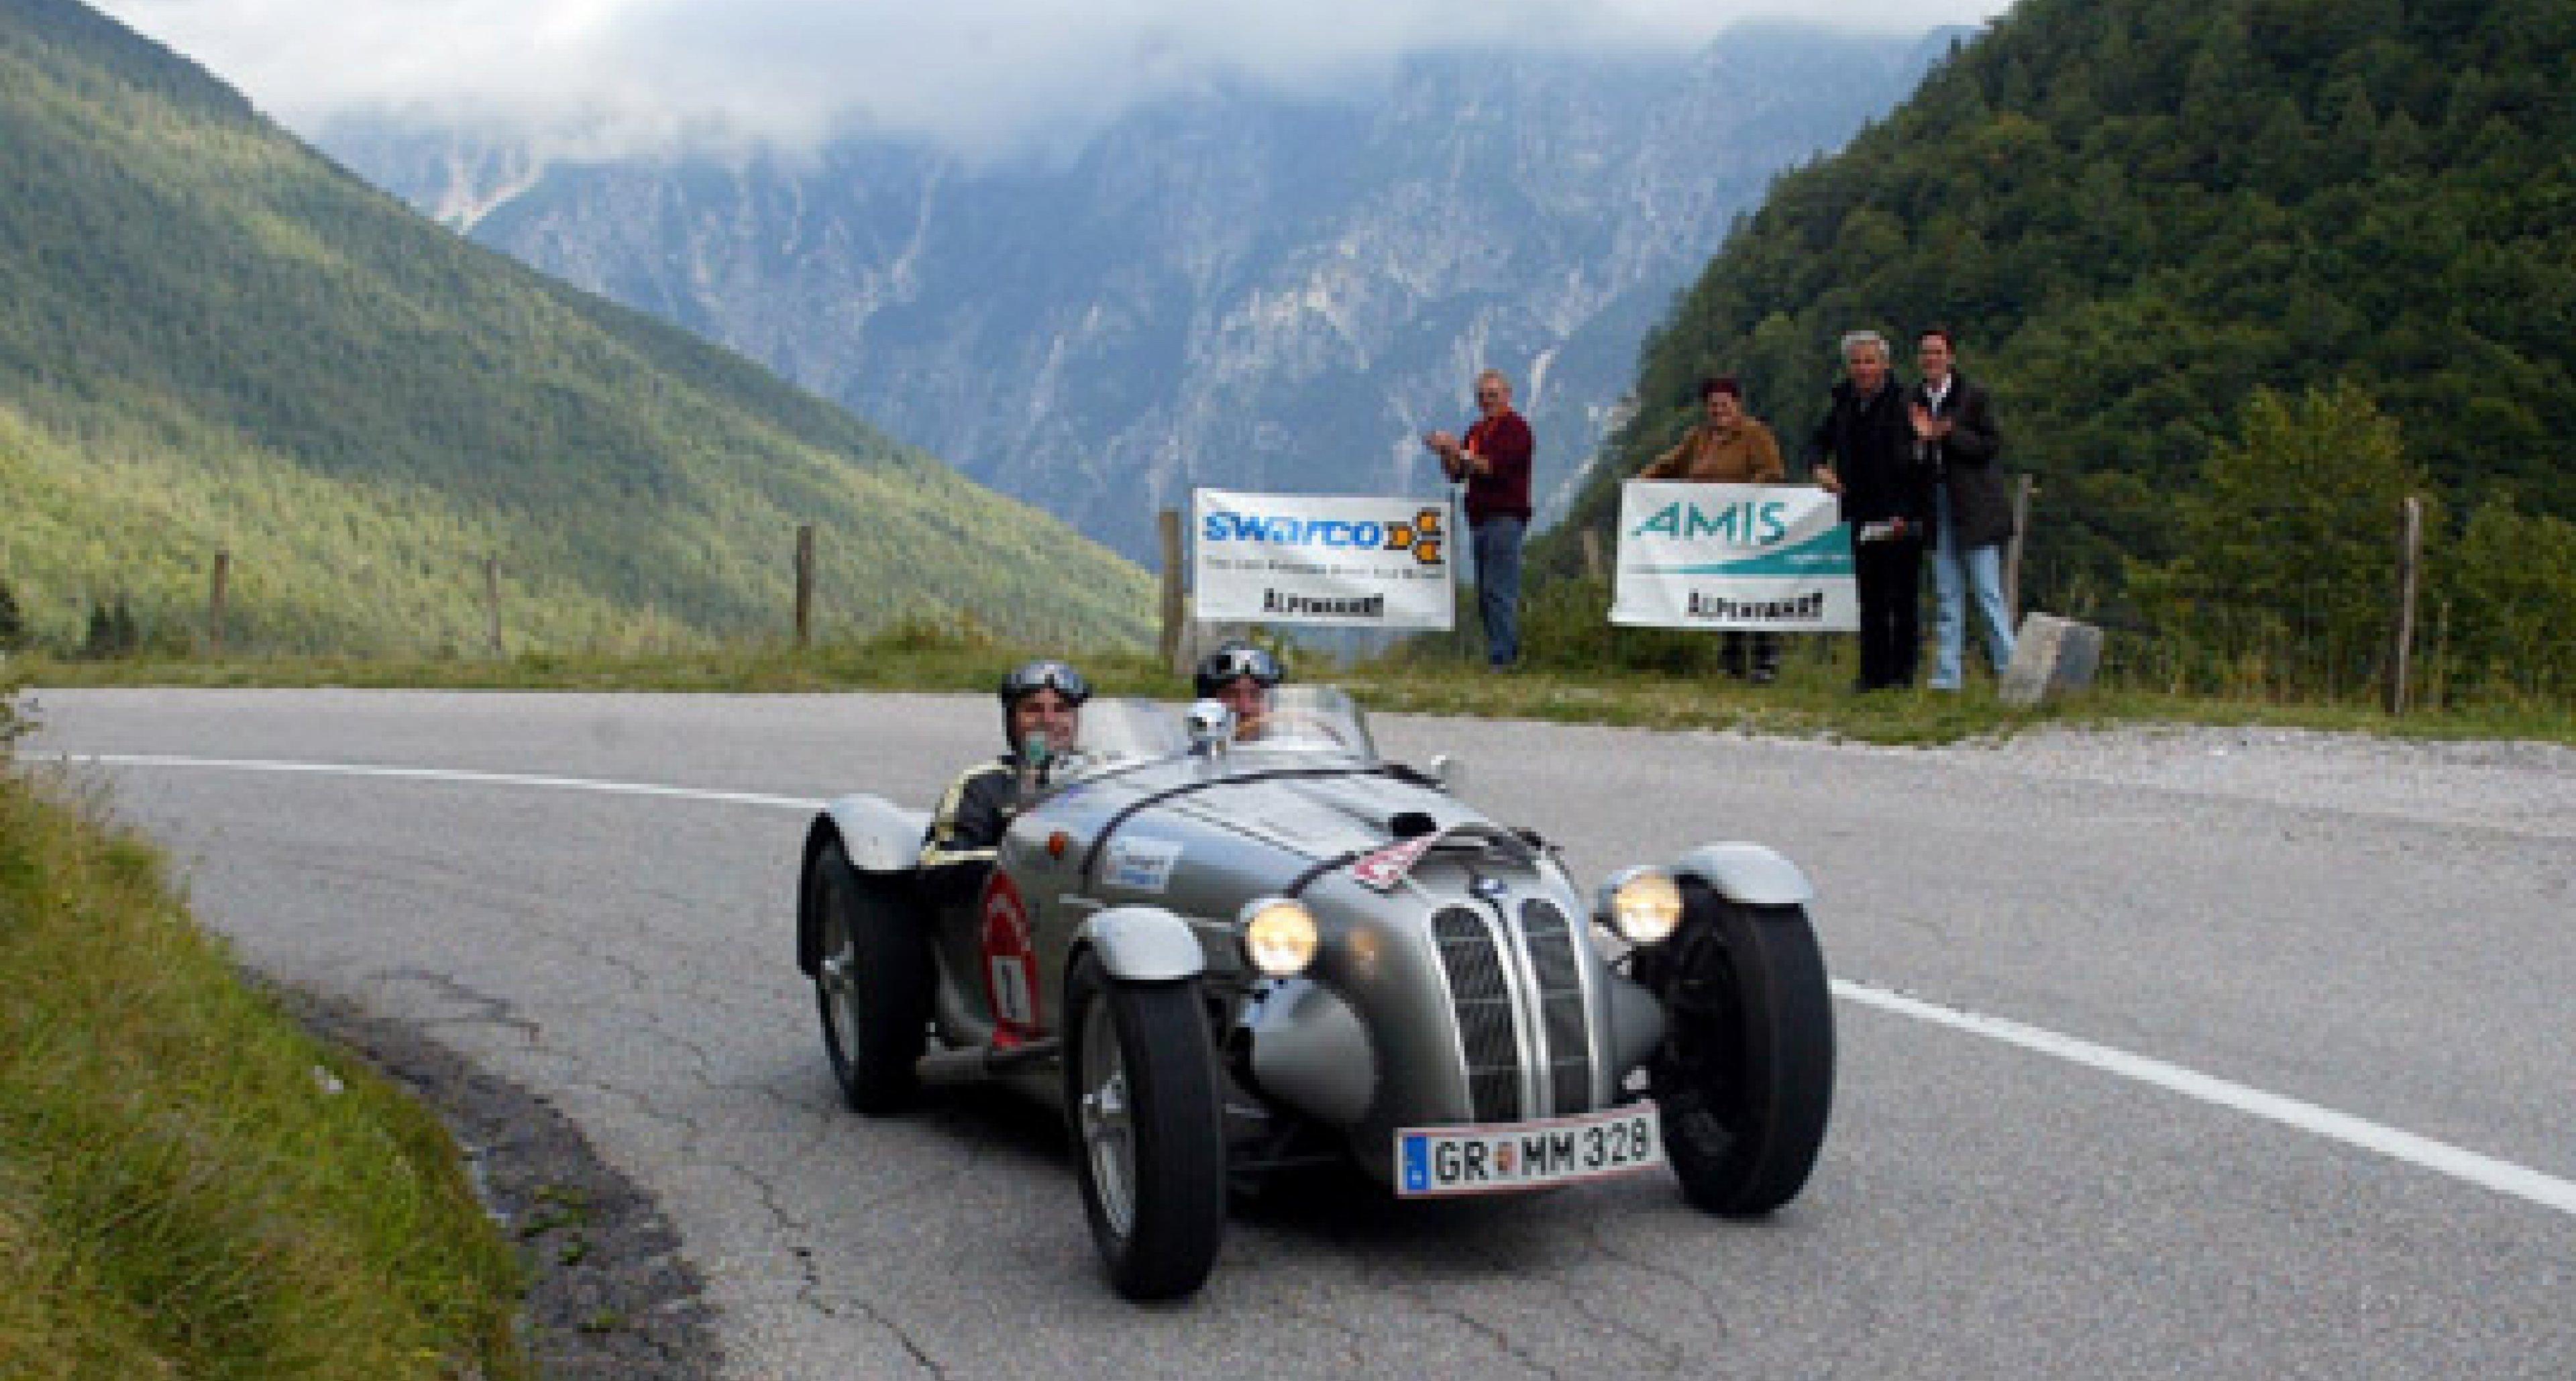 Alpenfahrt 2004 - The winner takes it all...